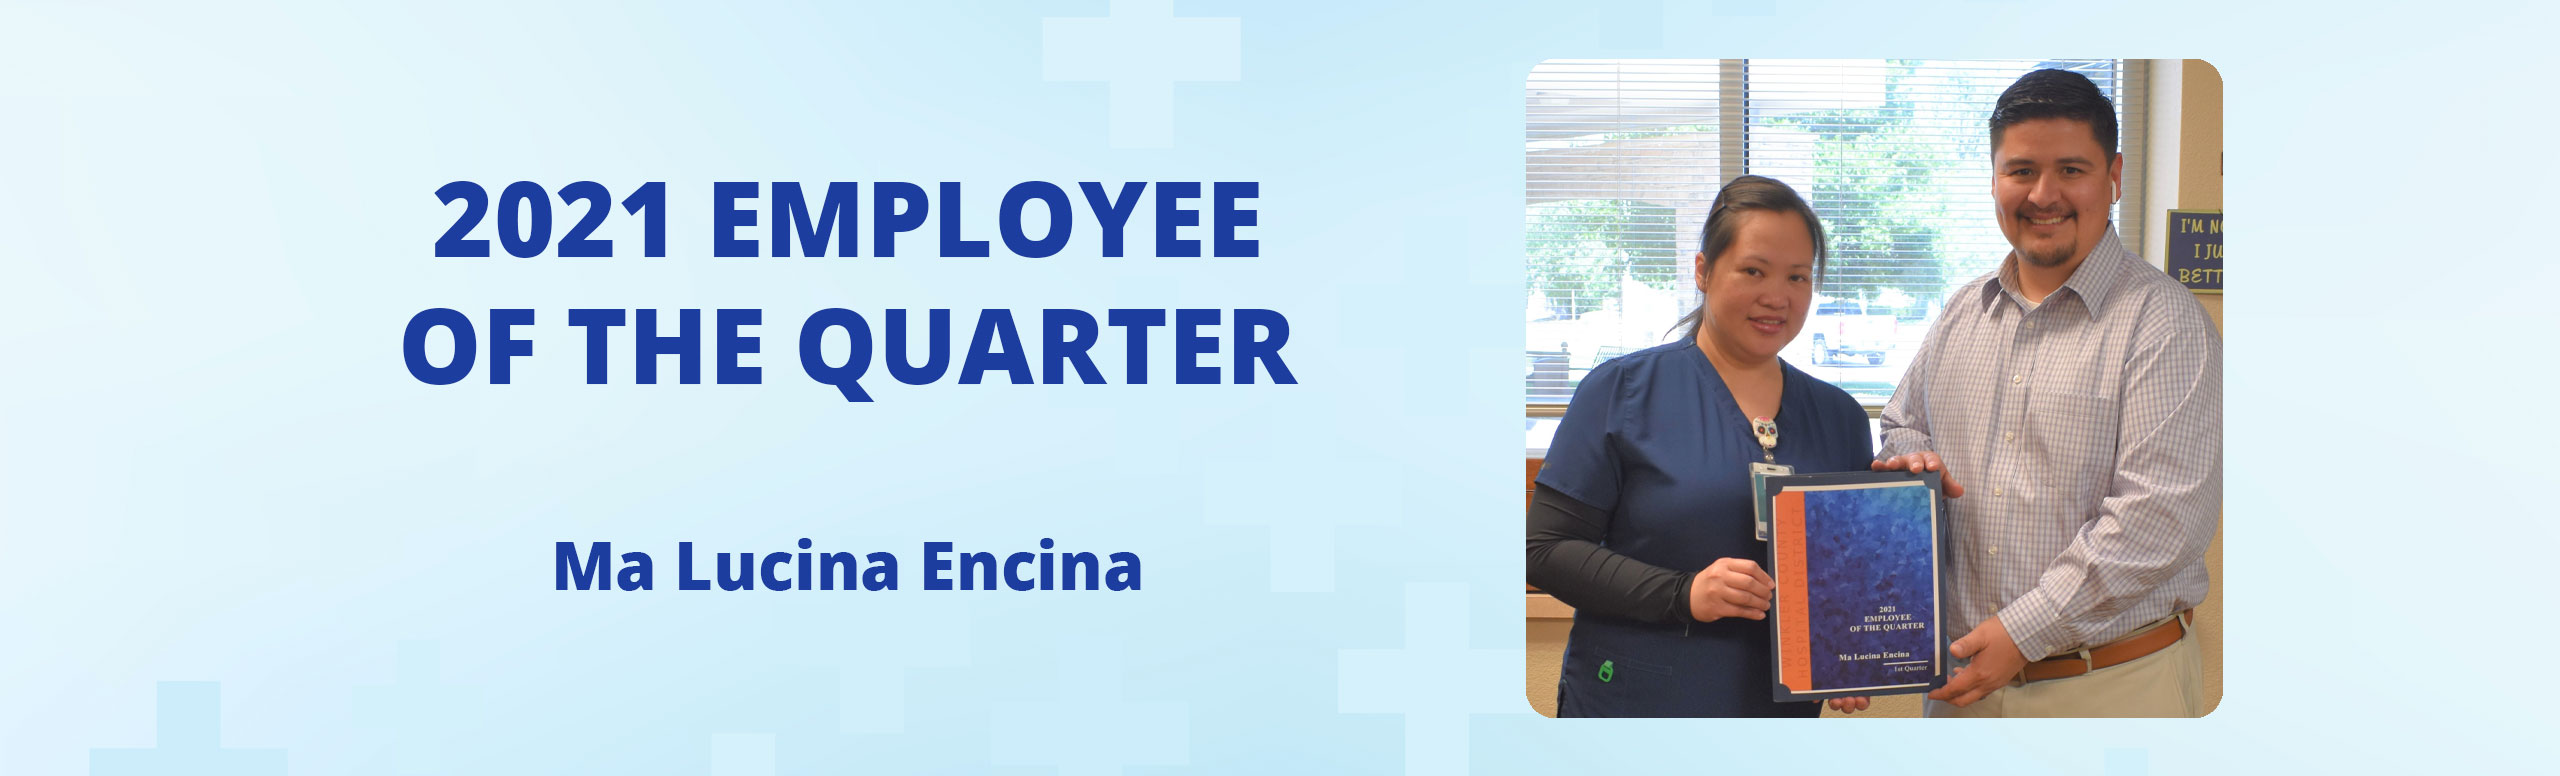 2021 Employee of the Quarter